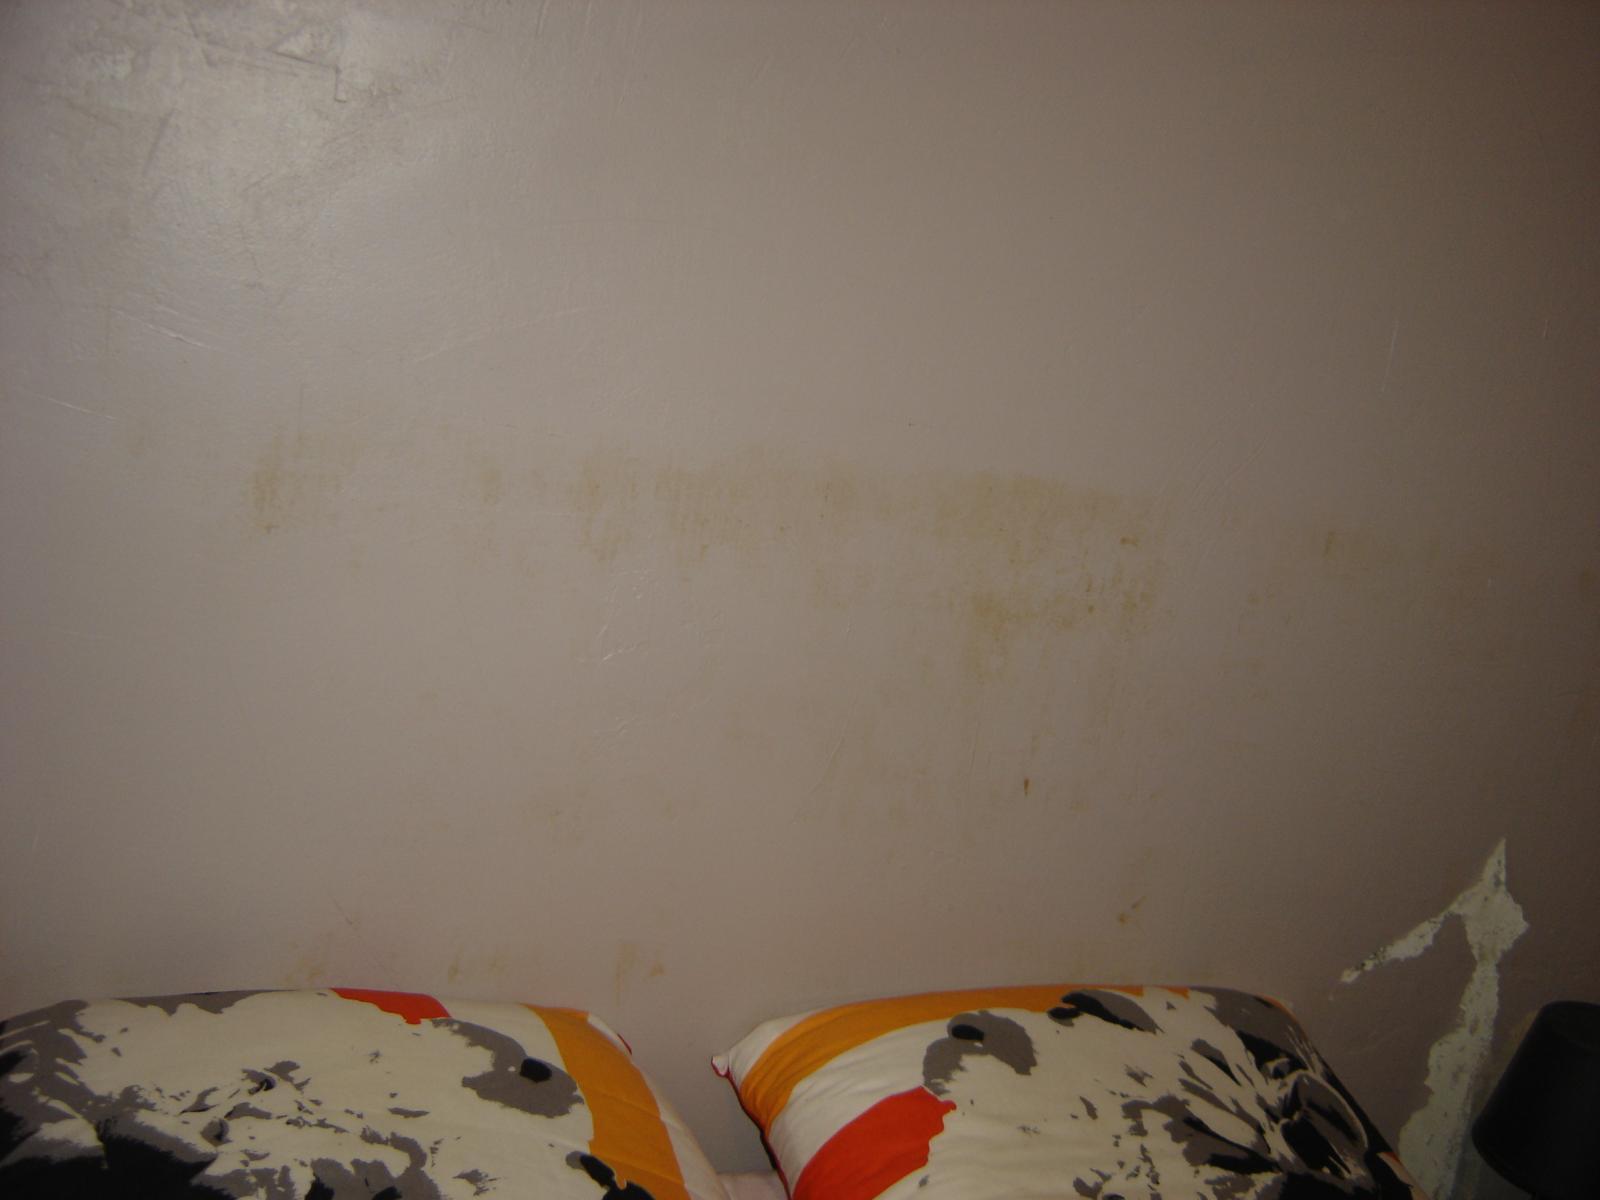 Tache Humidit Mur Latest Tache Humidit Mur With Tache Humidit Mur